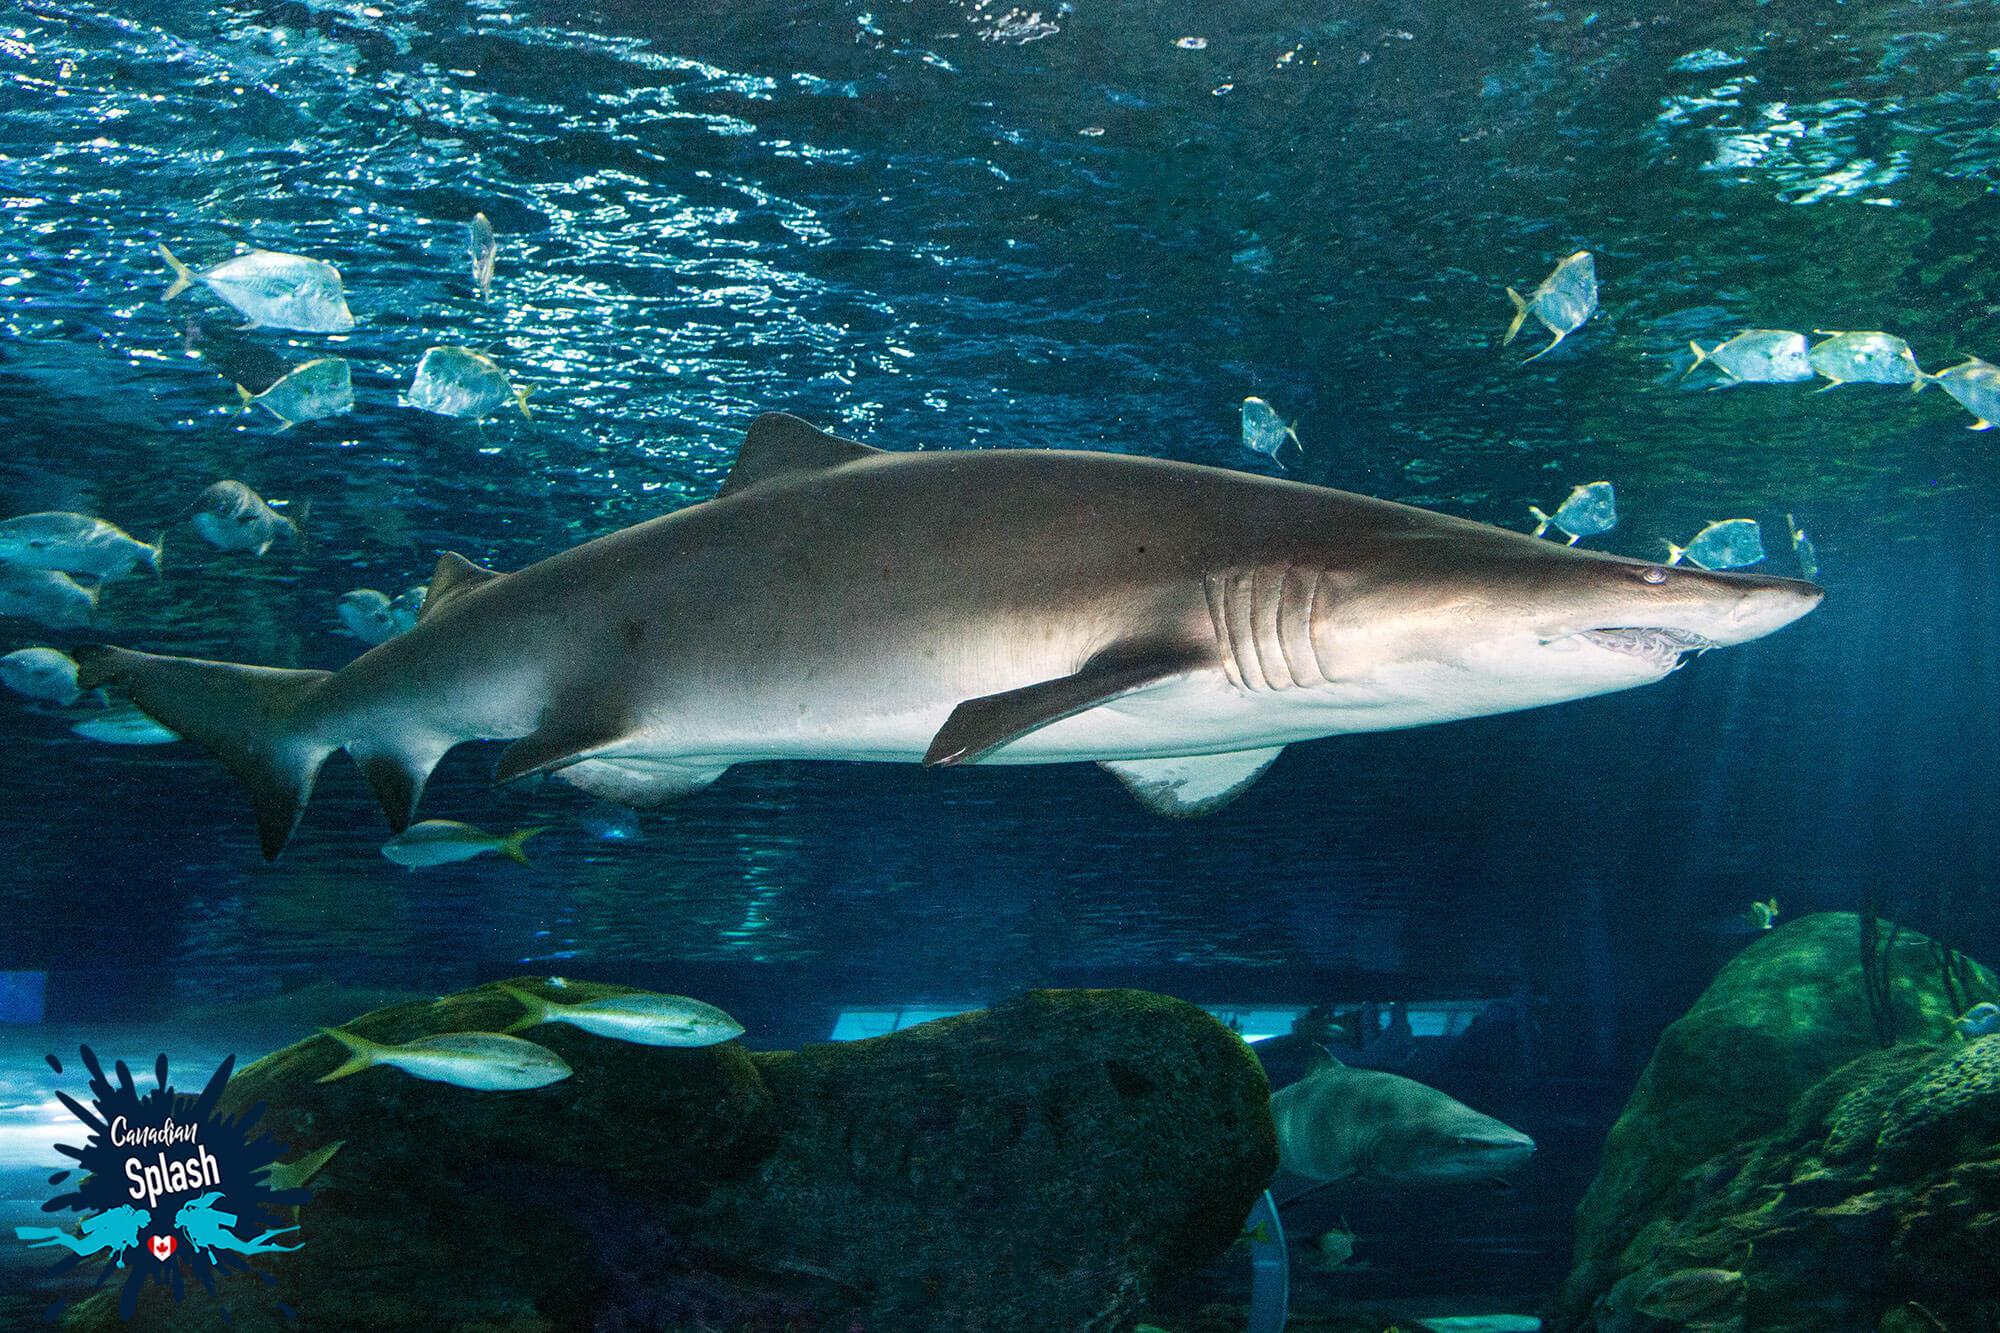 A Sand Tiger Shark Circling The Dangerous Lagoon Tank At Ripley's Aquarium, Ontario, Canadian Splash